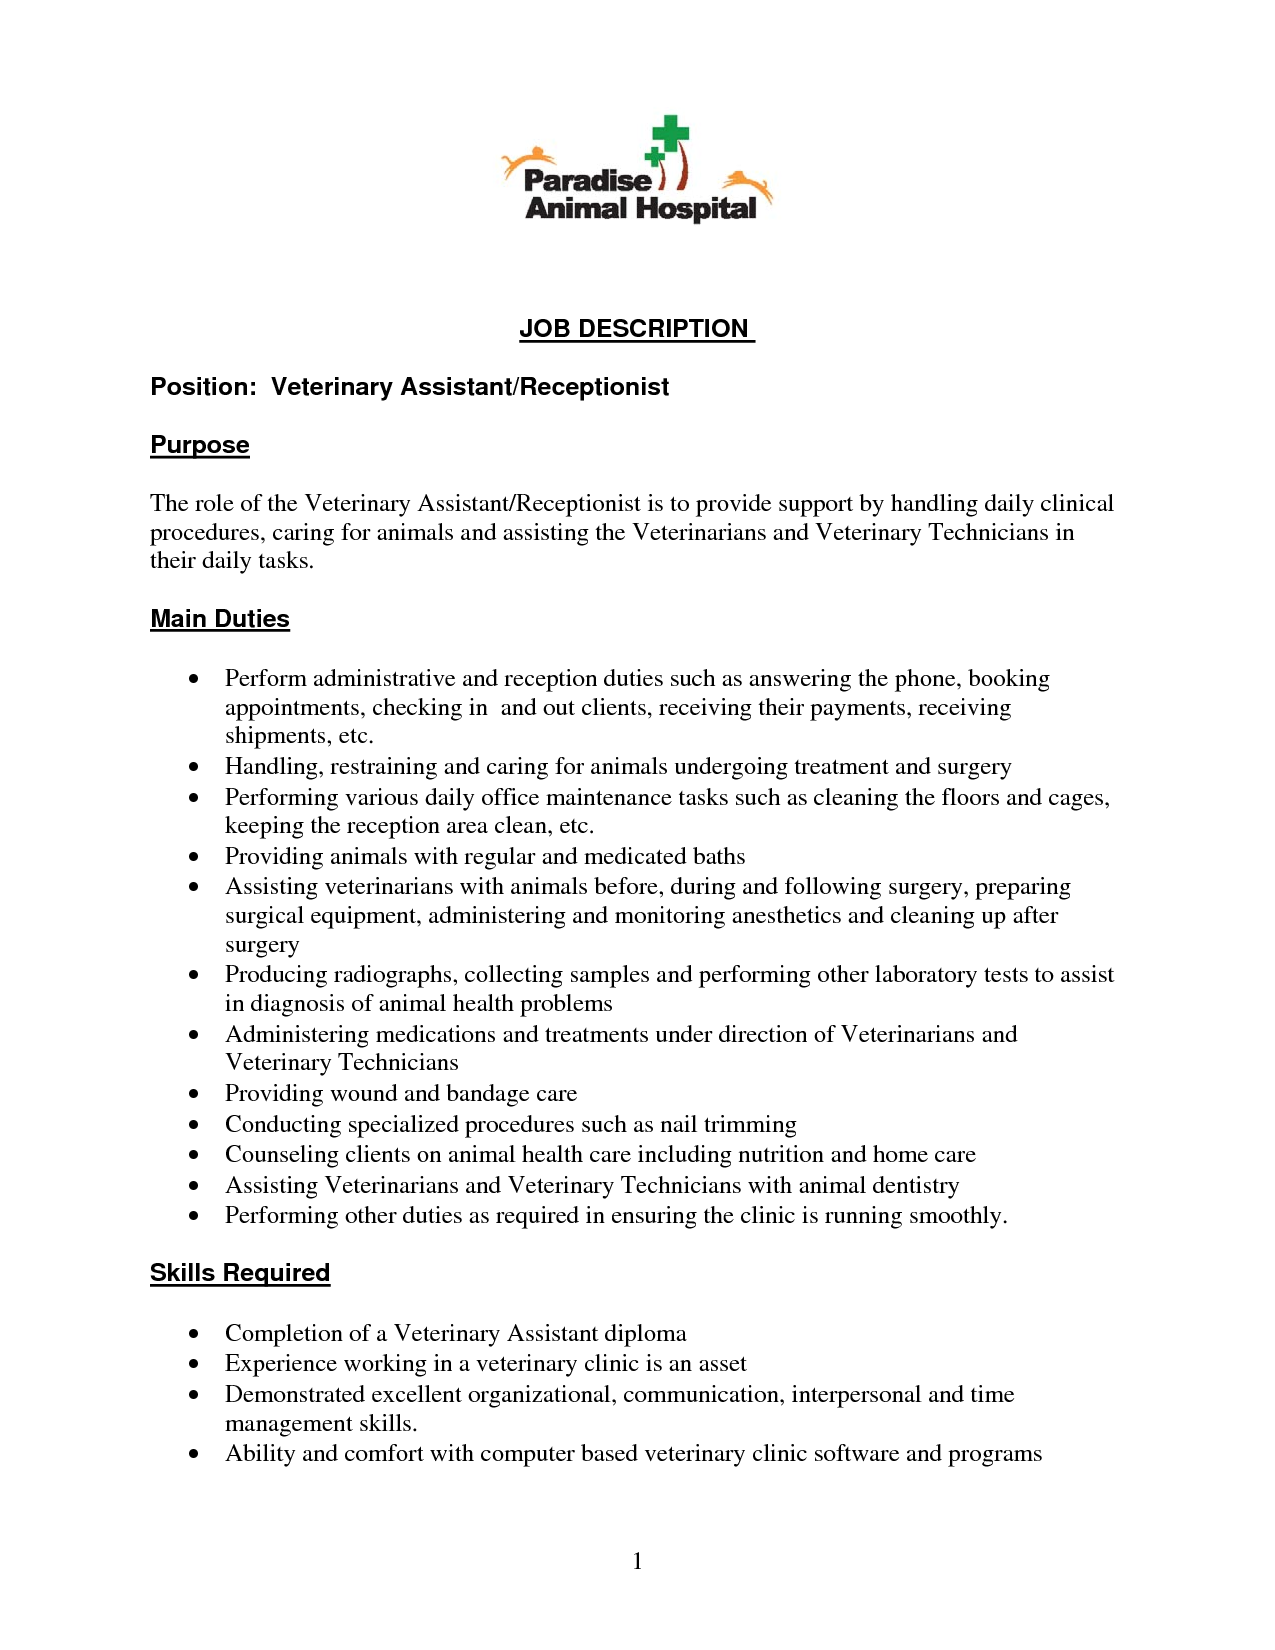 Resume Examples Veterinary Receptionist 1 Resume Examples Resume